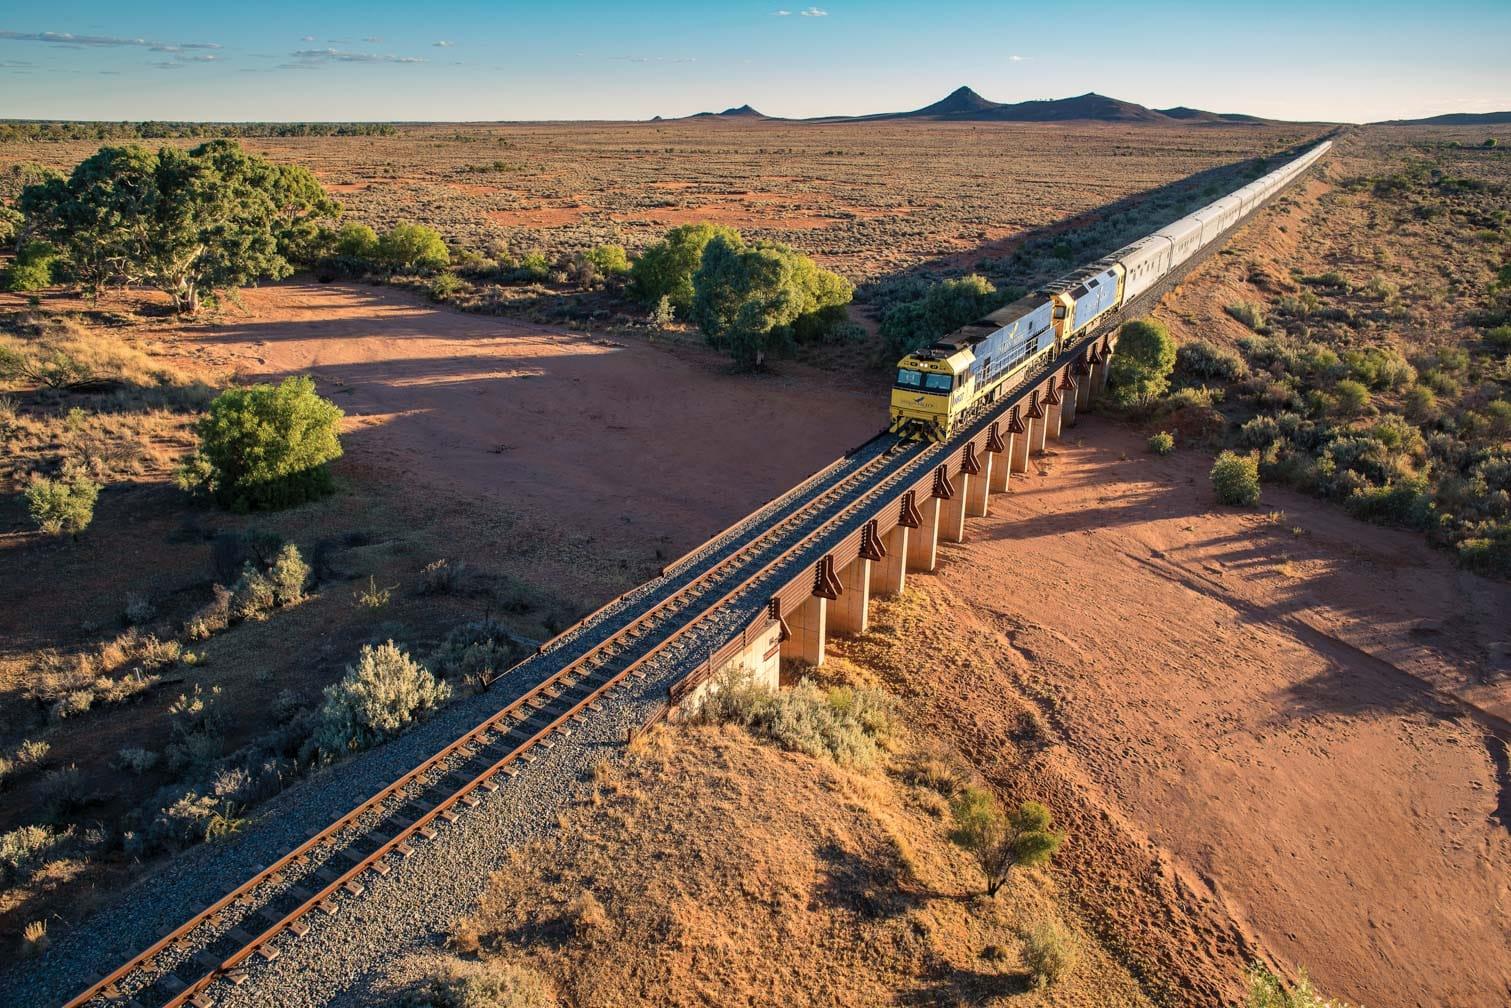 Indian Pacific train heading east towards Broken Hill Pinnacles